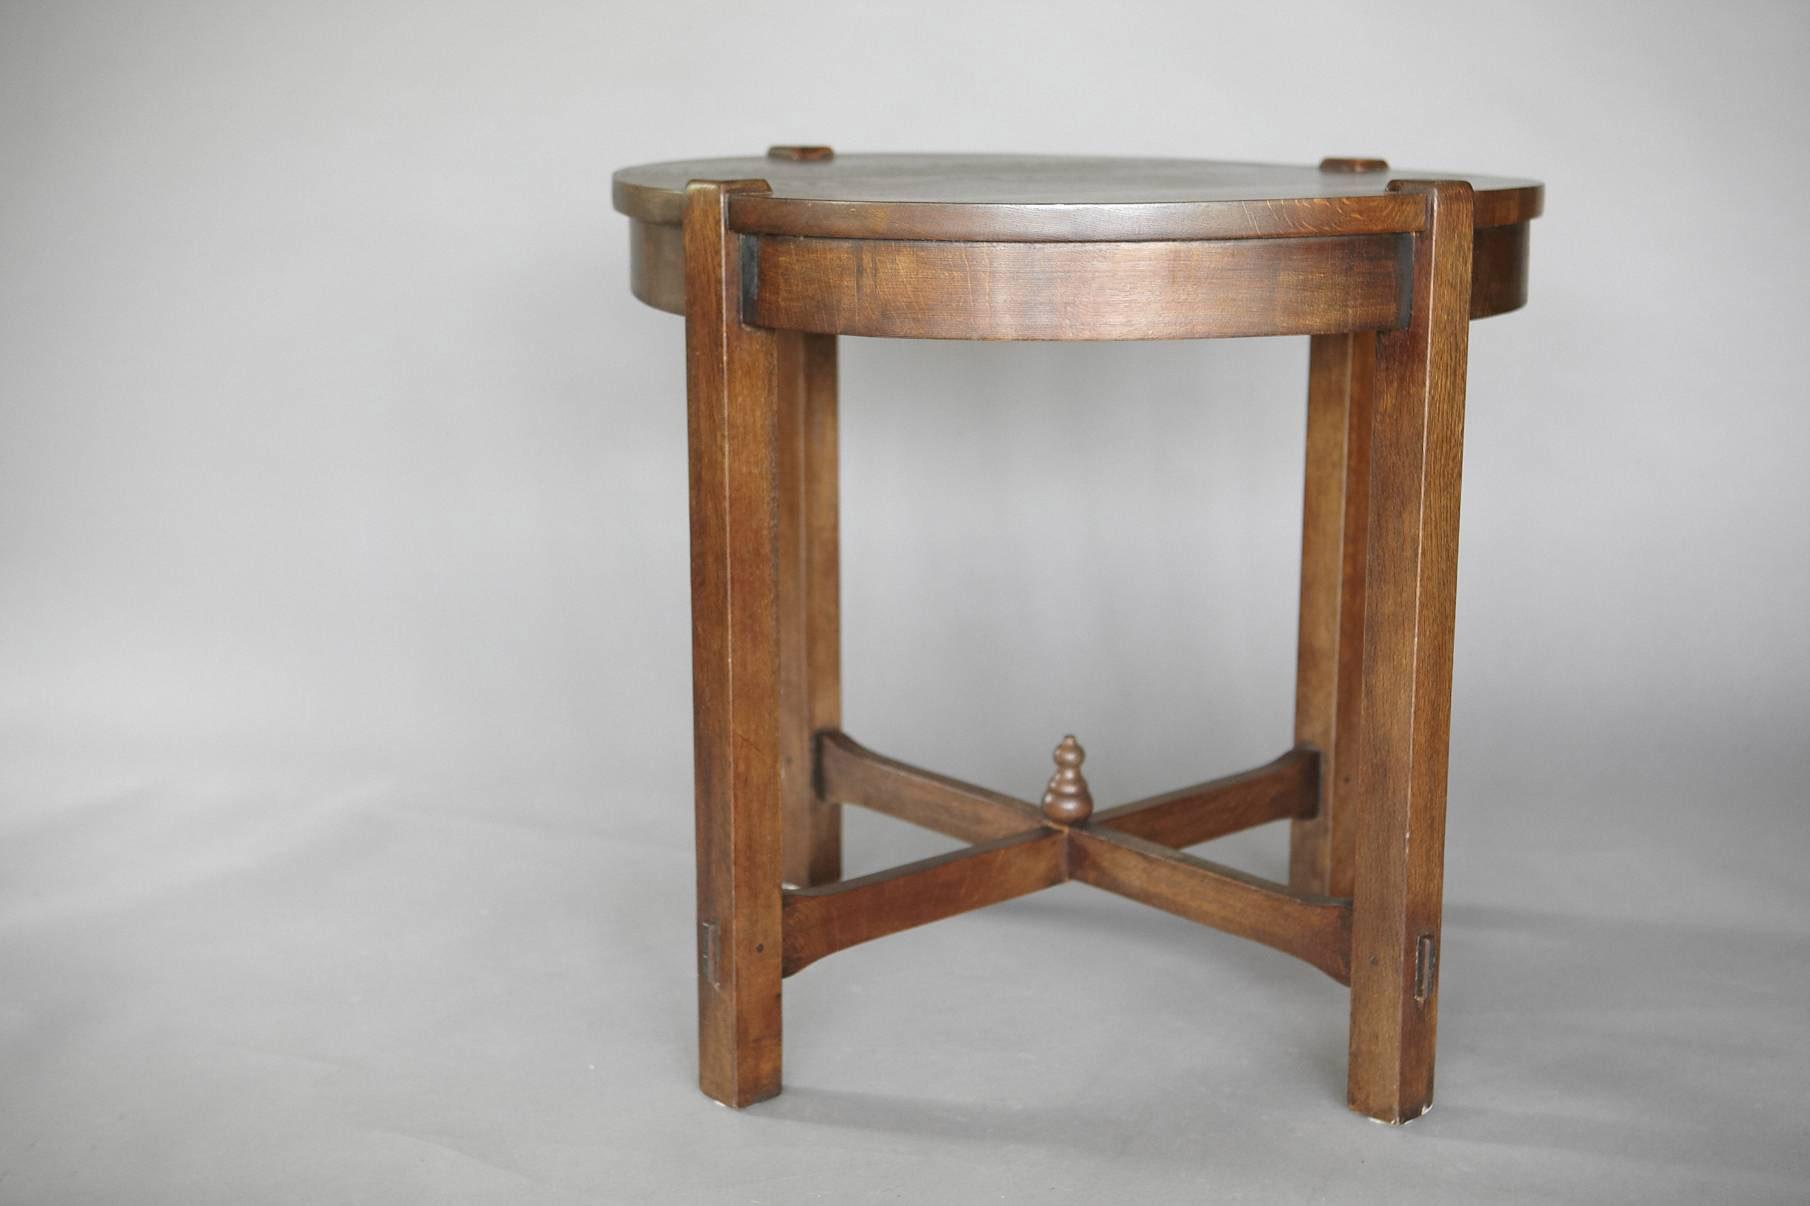 Antique oak arts crafts oak lamp table jens buettner design series0415 artsandcrafts round lamp table copy01 mg8779g geotapseo Choice Image